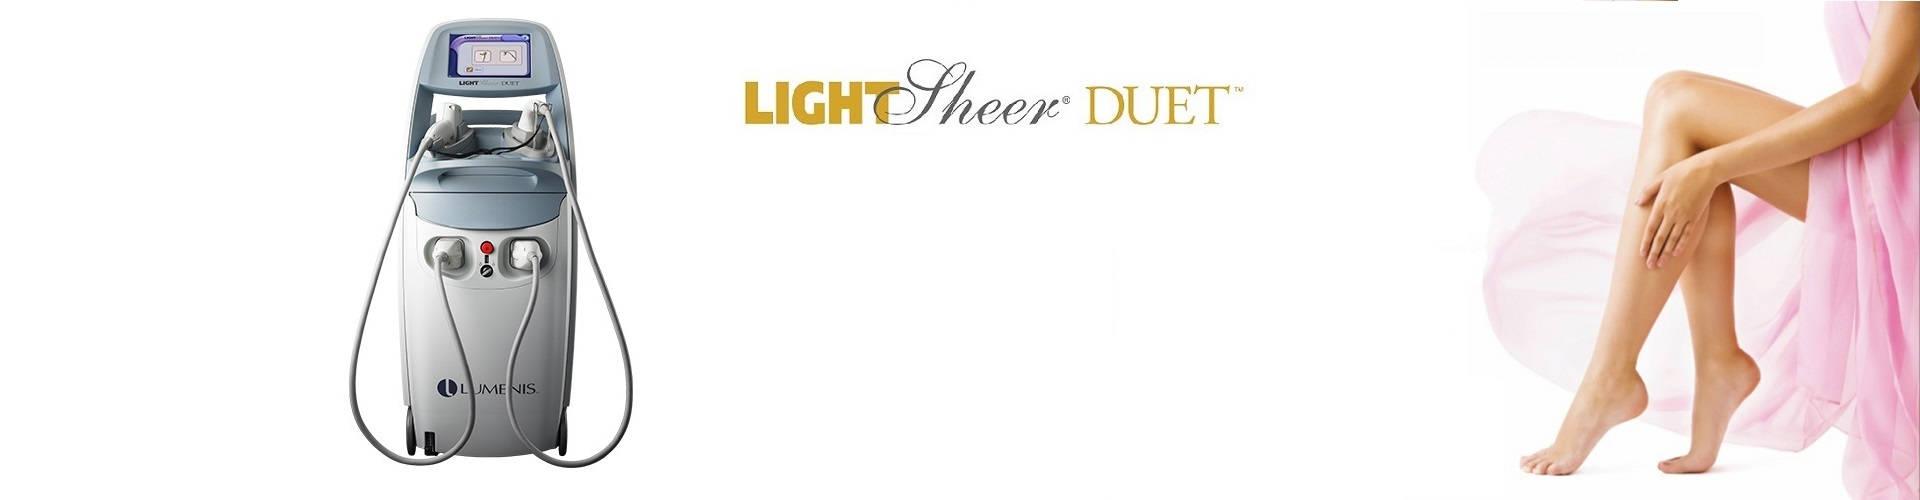 Wynajem LightSheer Duet